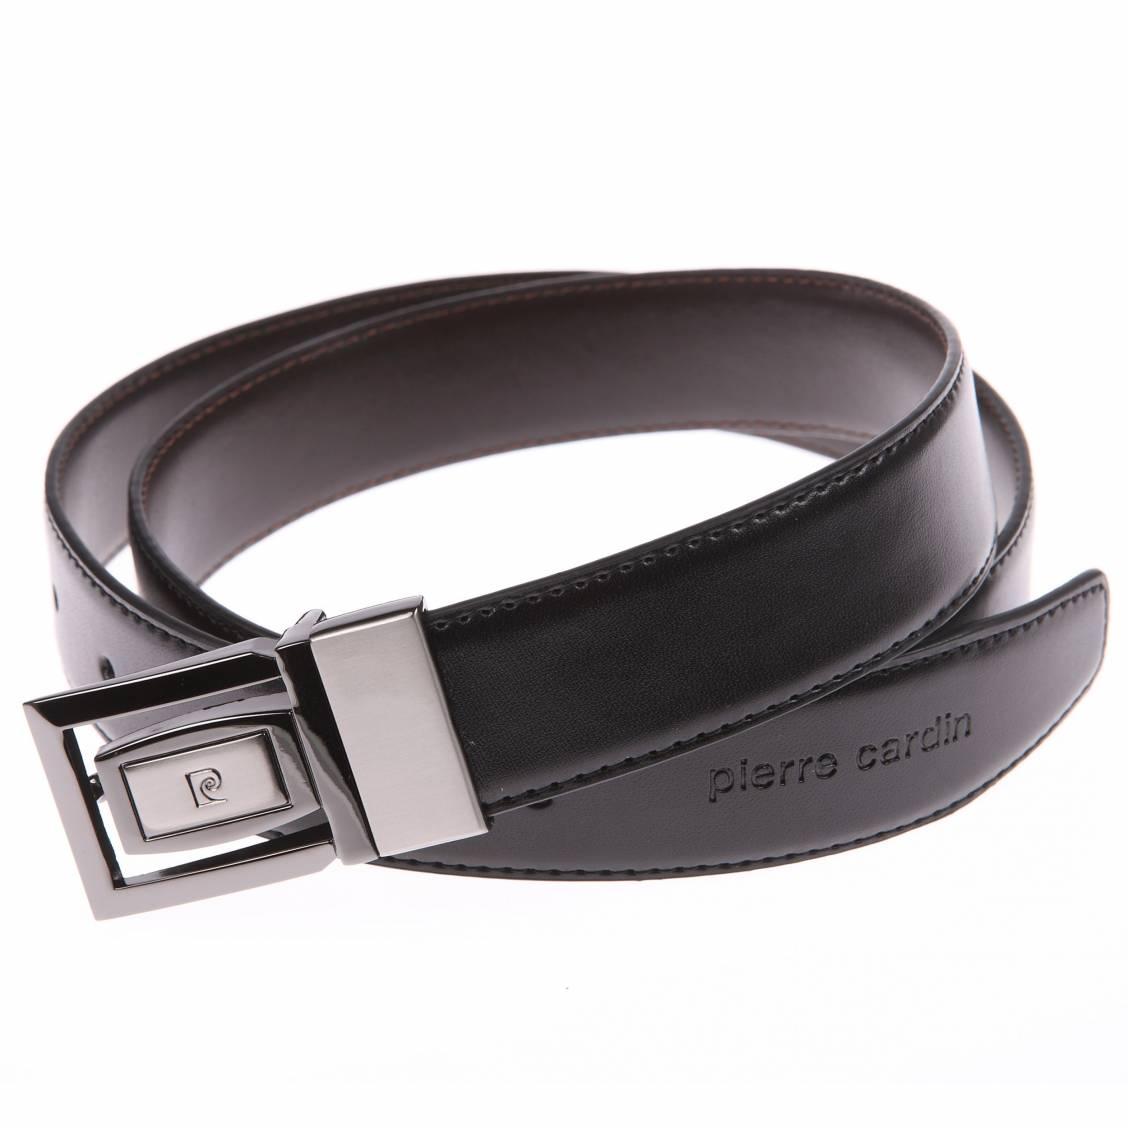 ceinture pierre cardin en cuir réversible